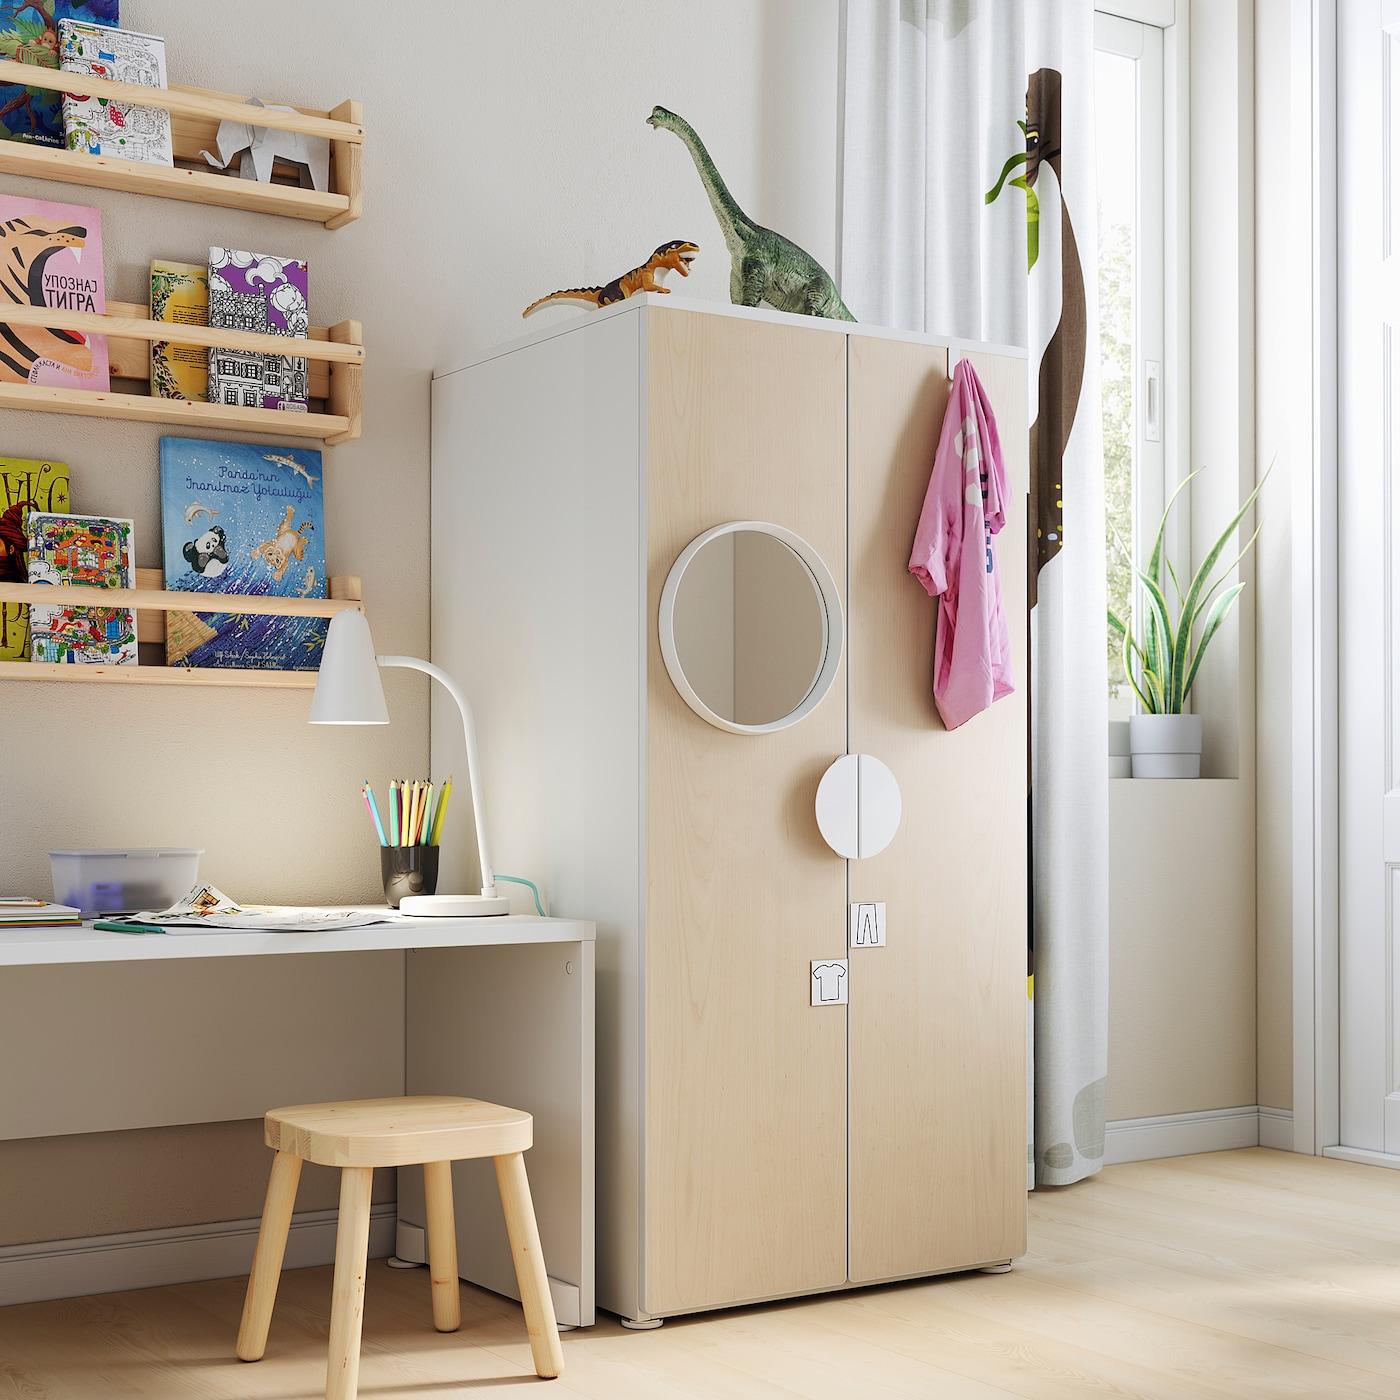 SMÅSTAD / PLATSA Wardrobe, white/birch, 60x57x123 cm